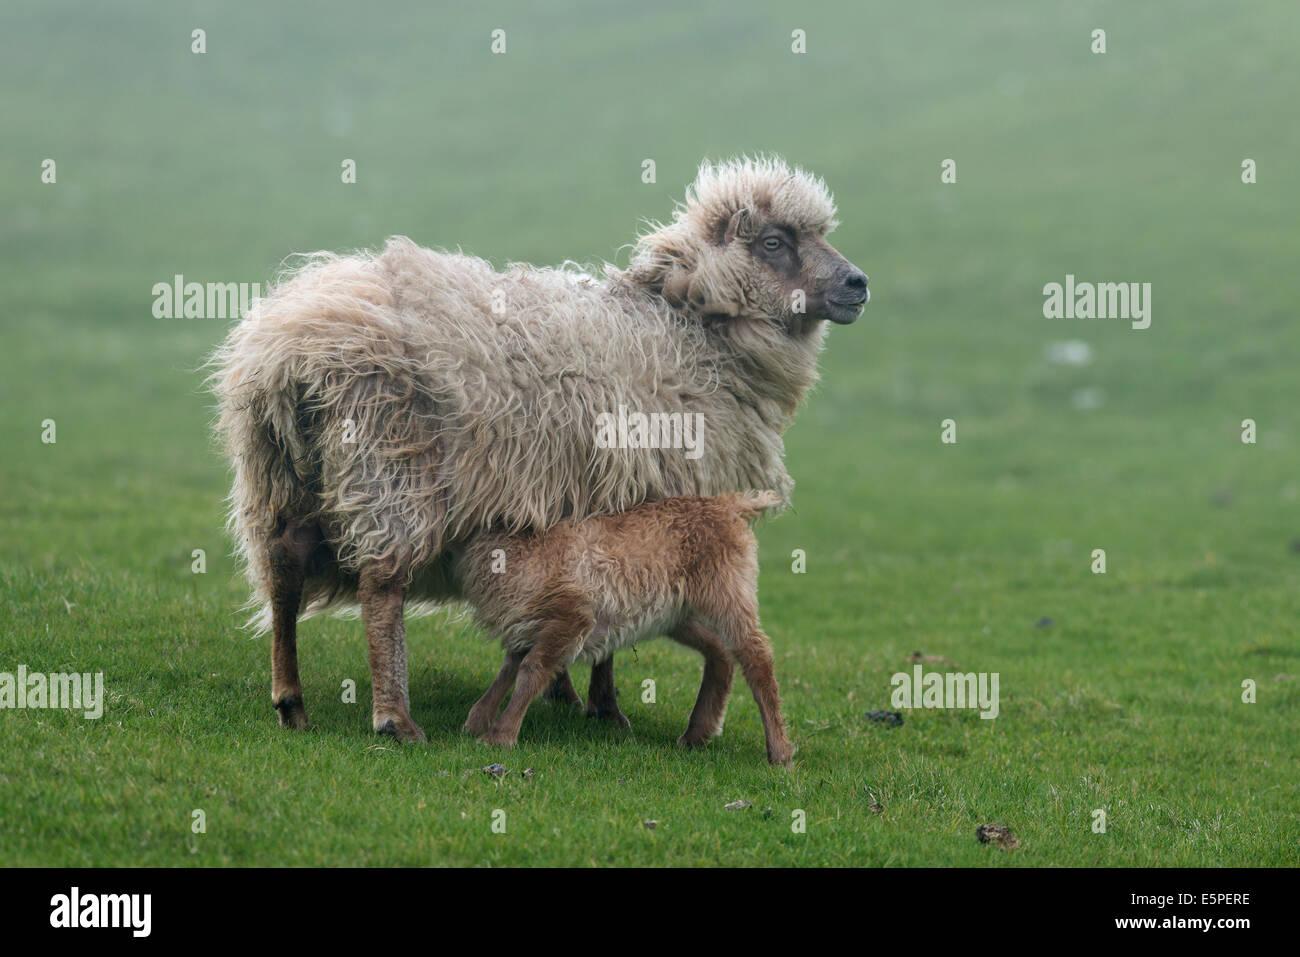 Ewe with lamb, Mykines, Útoyggjar, Outer Islands, Faroe Islands, Denmark - Stock Image